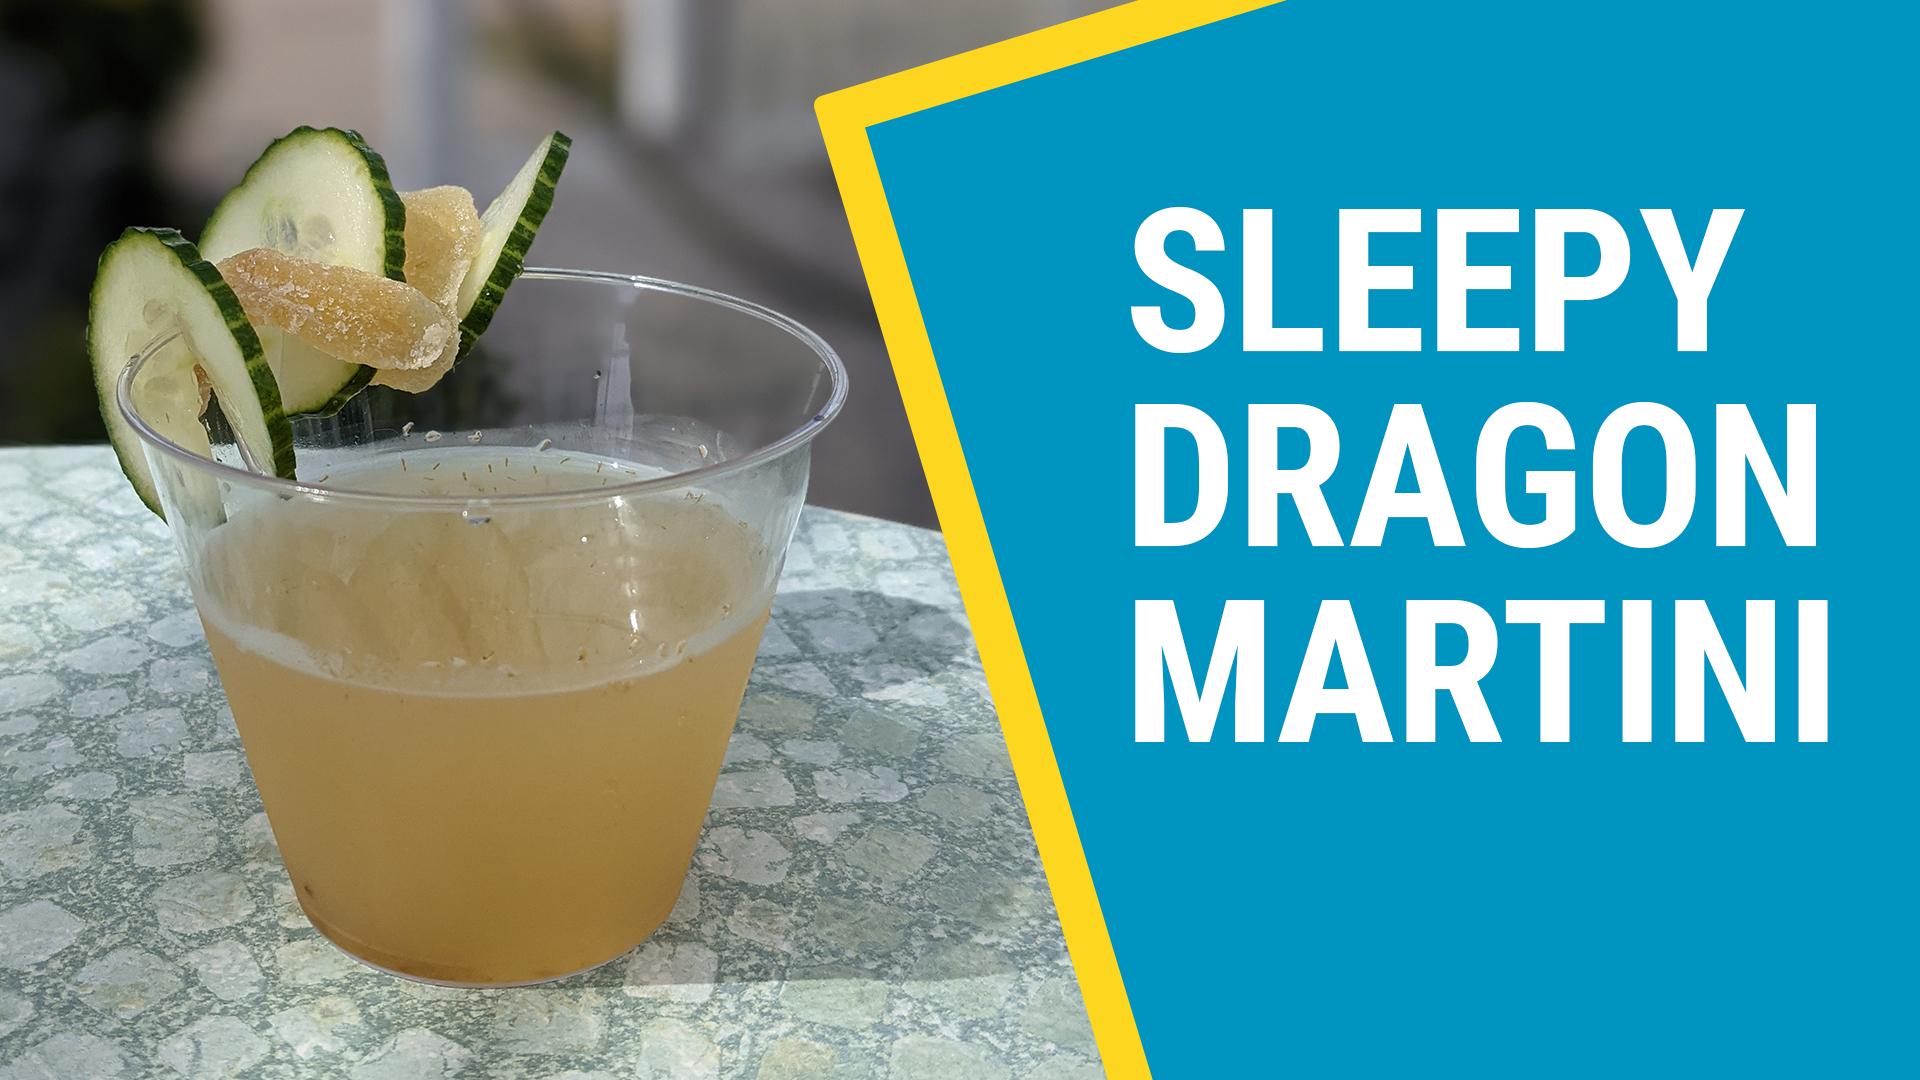 Sleepy Dragon Martini